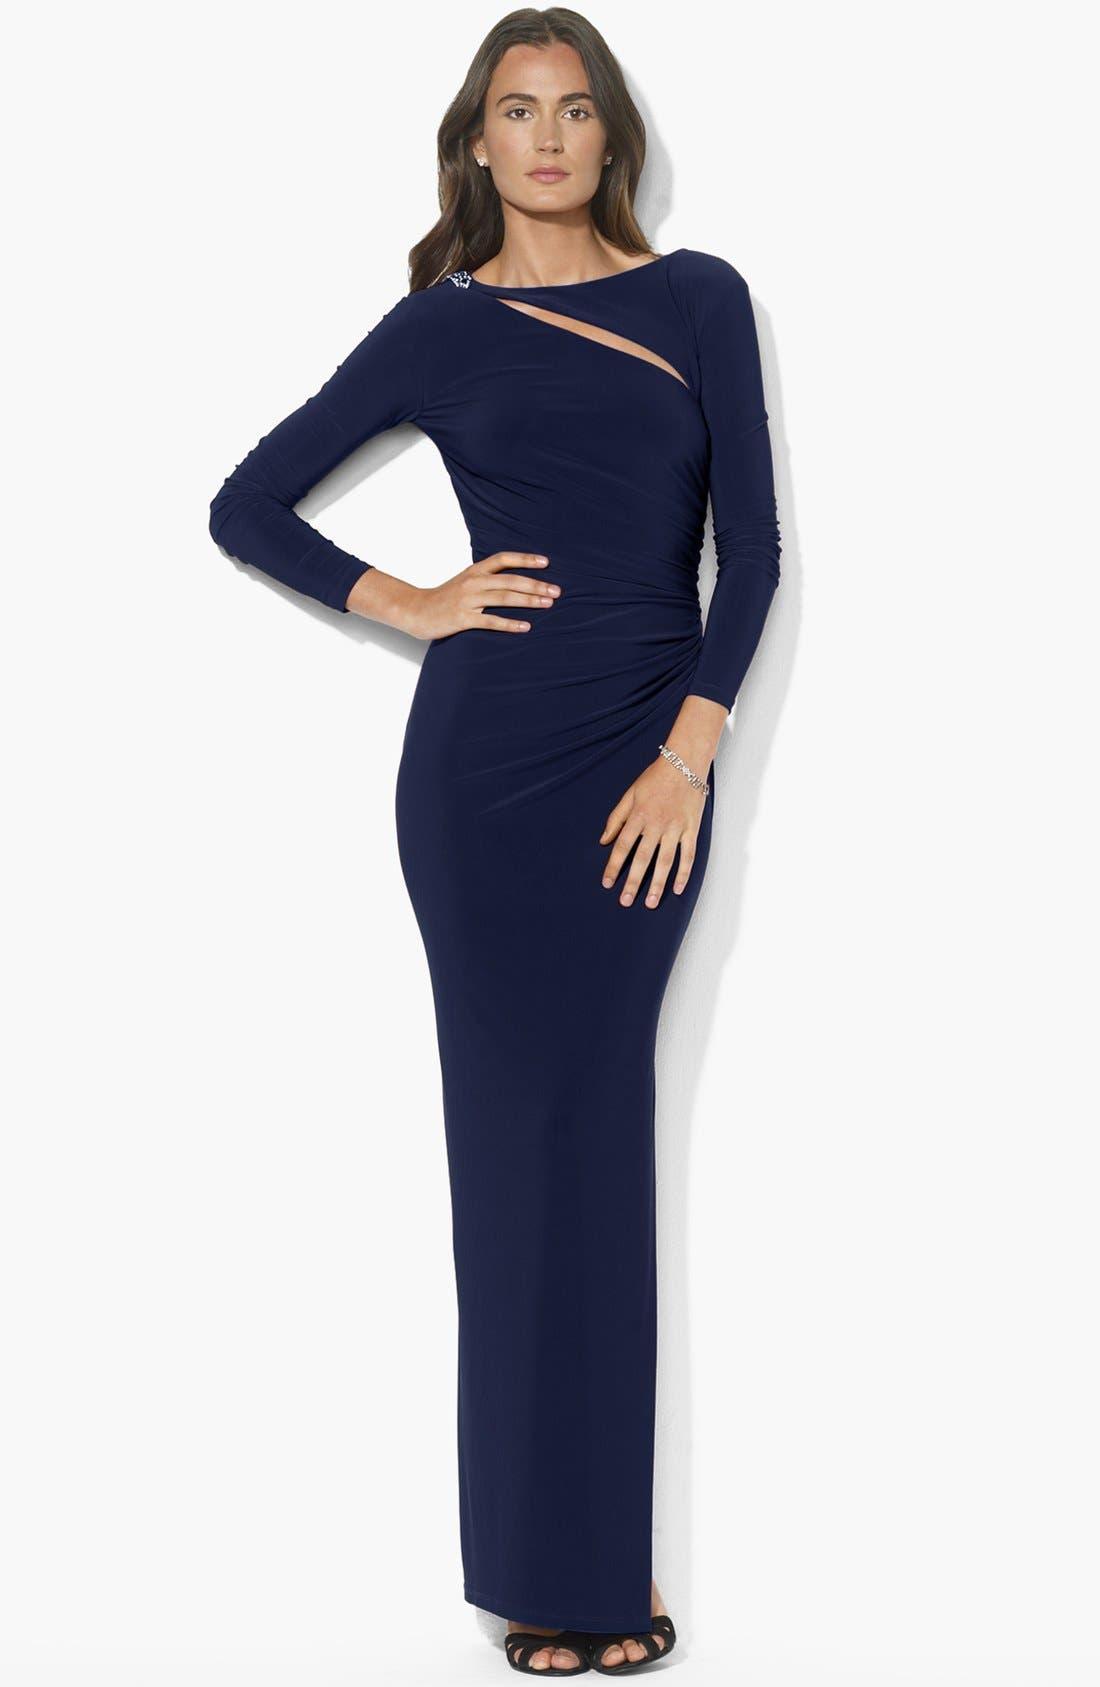 Alternate Image 1 Selected - Lauren Ralph Lauren Cutout Jersey Gown